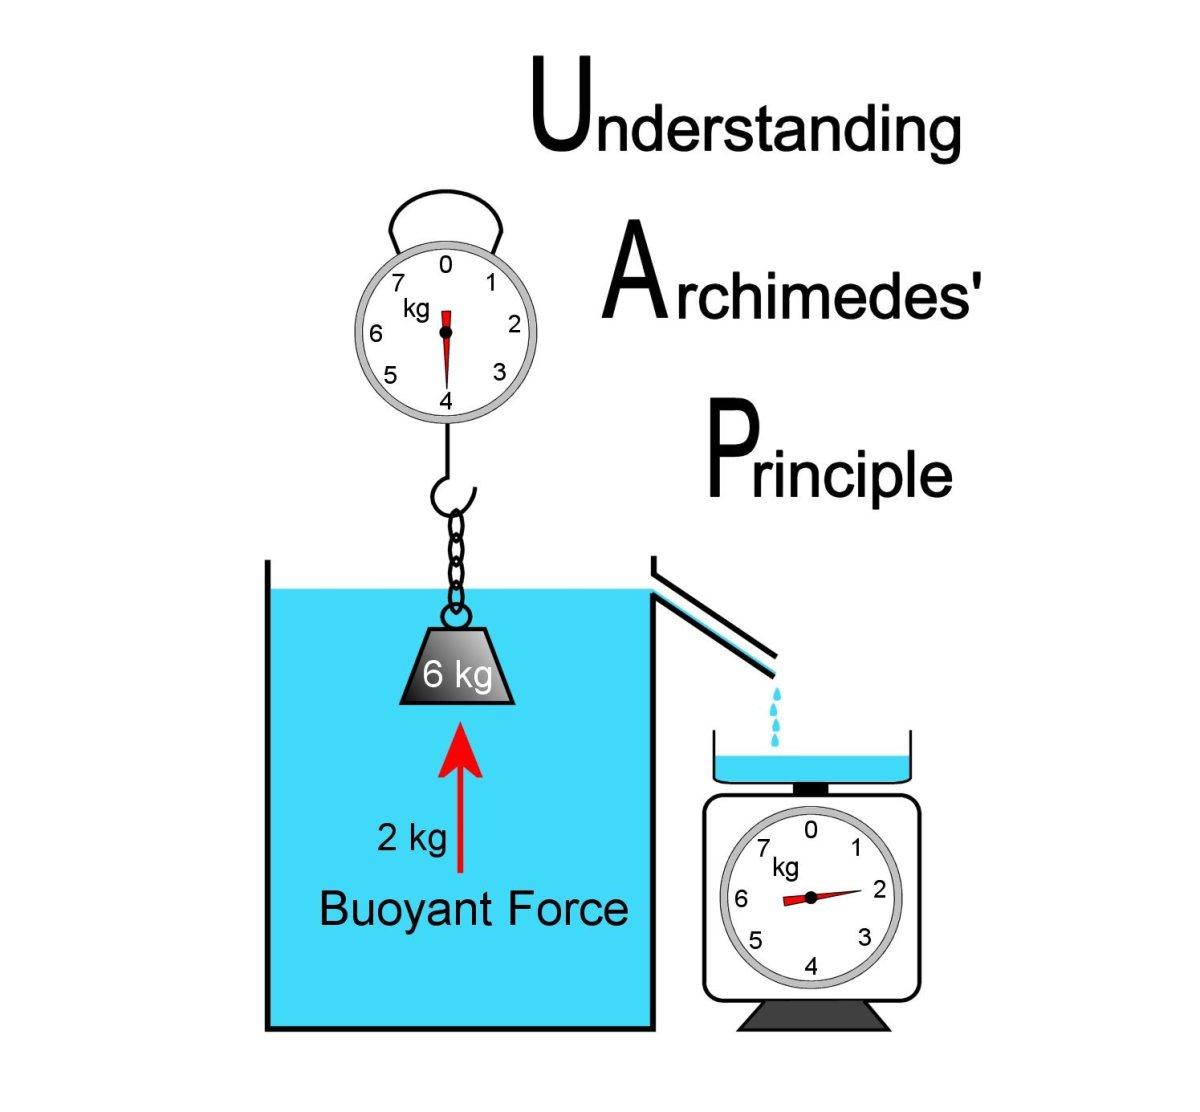 Archimedes' Principle.